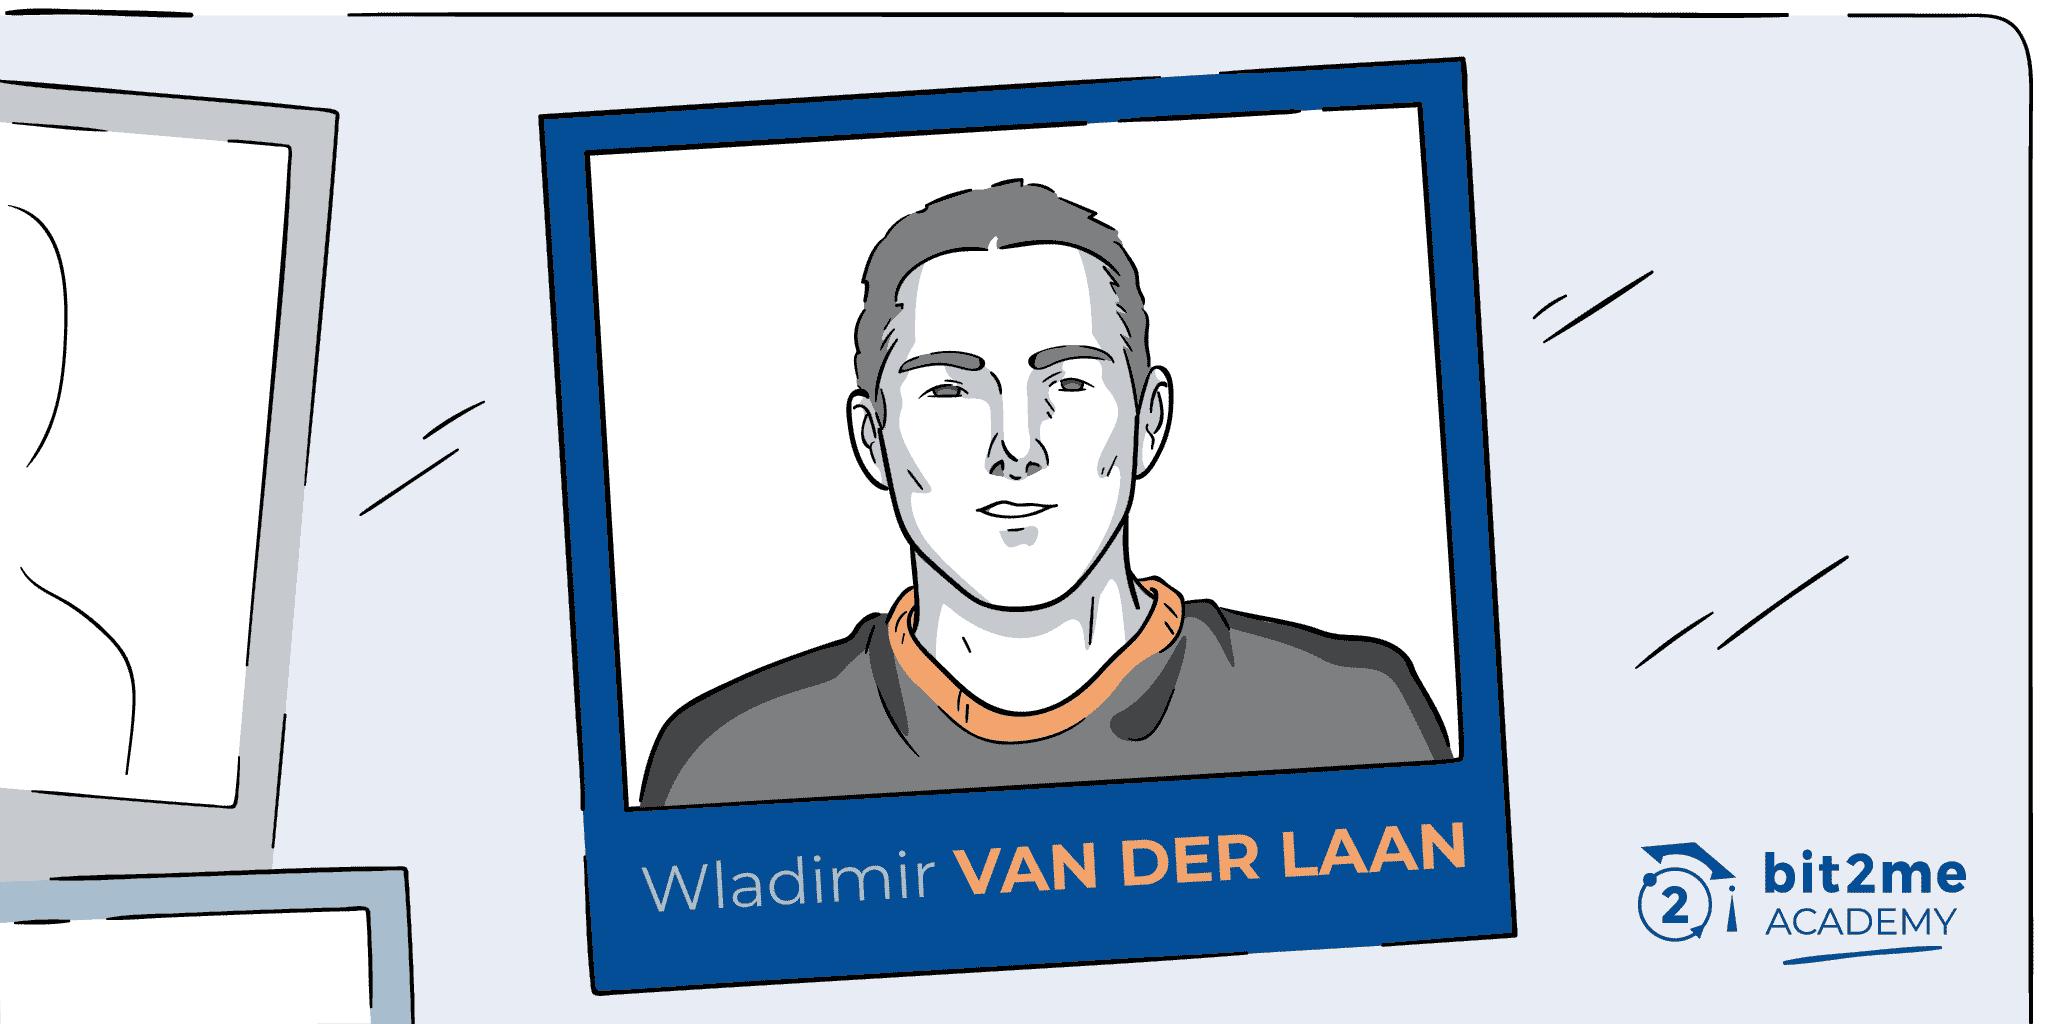 quien es Wladimir Van der Laan, quien es leader developer bitcoin